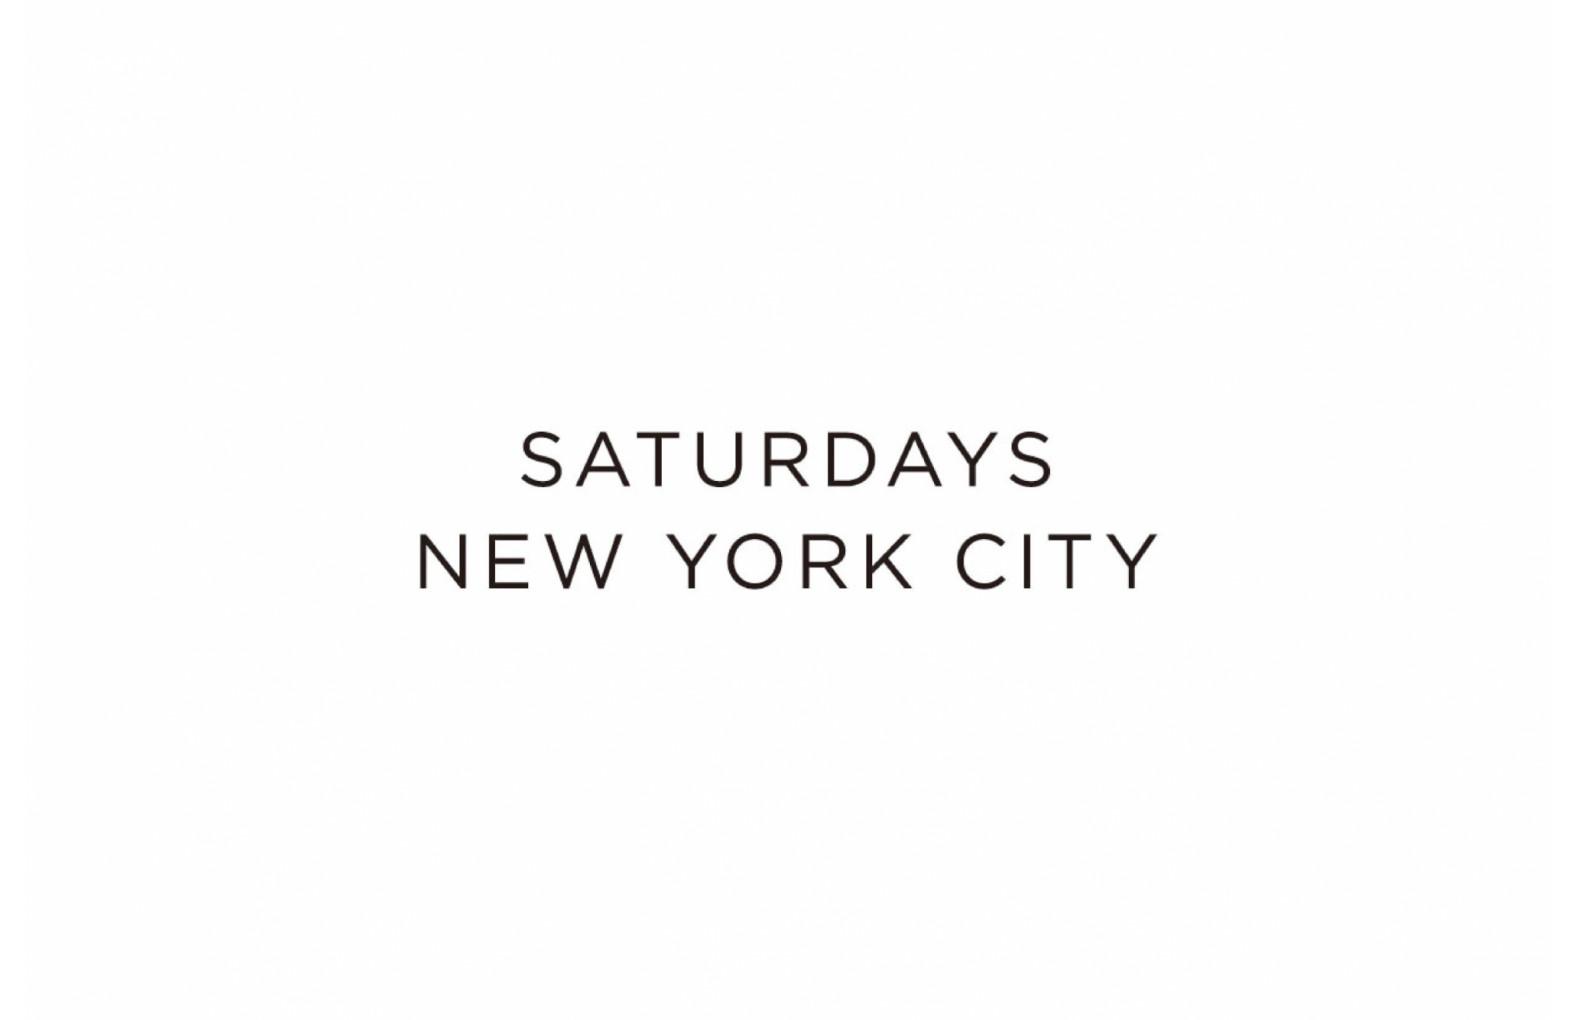 Saturdays New York City(CAFE)